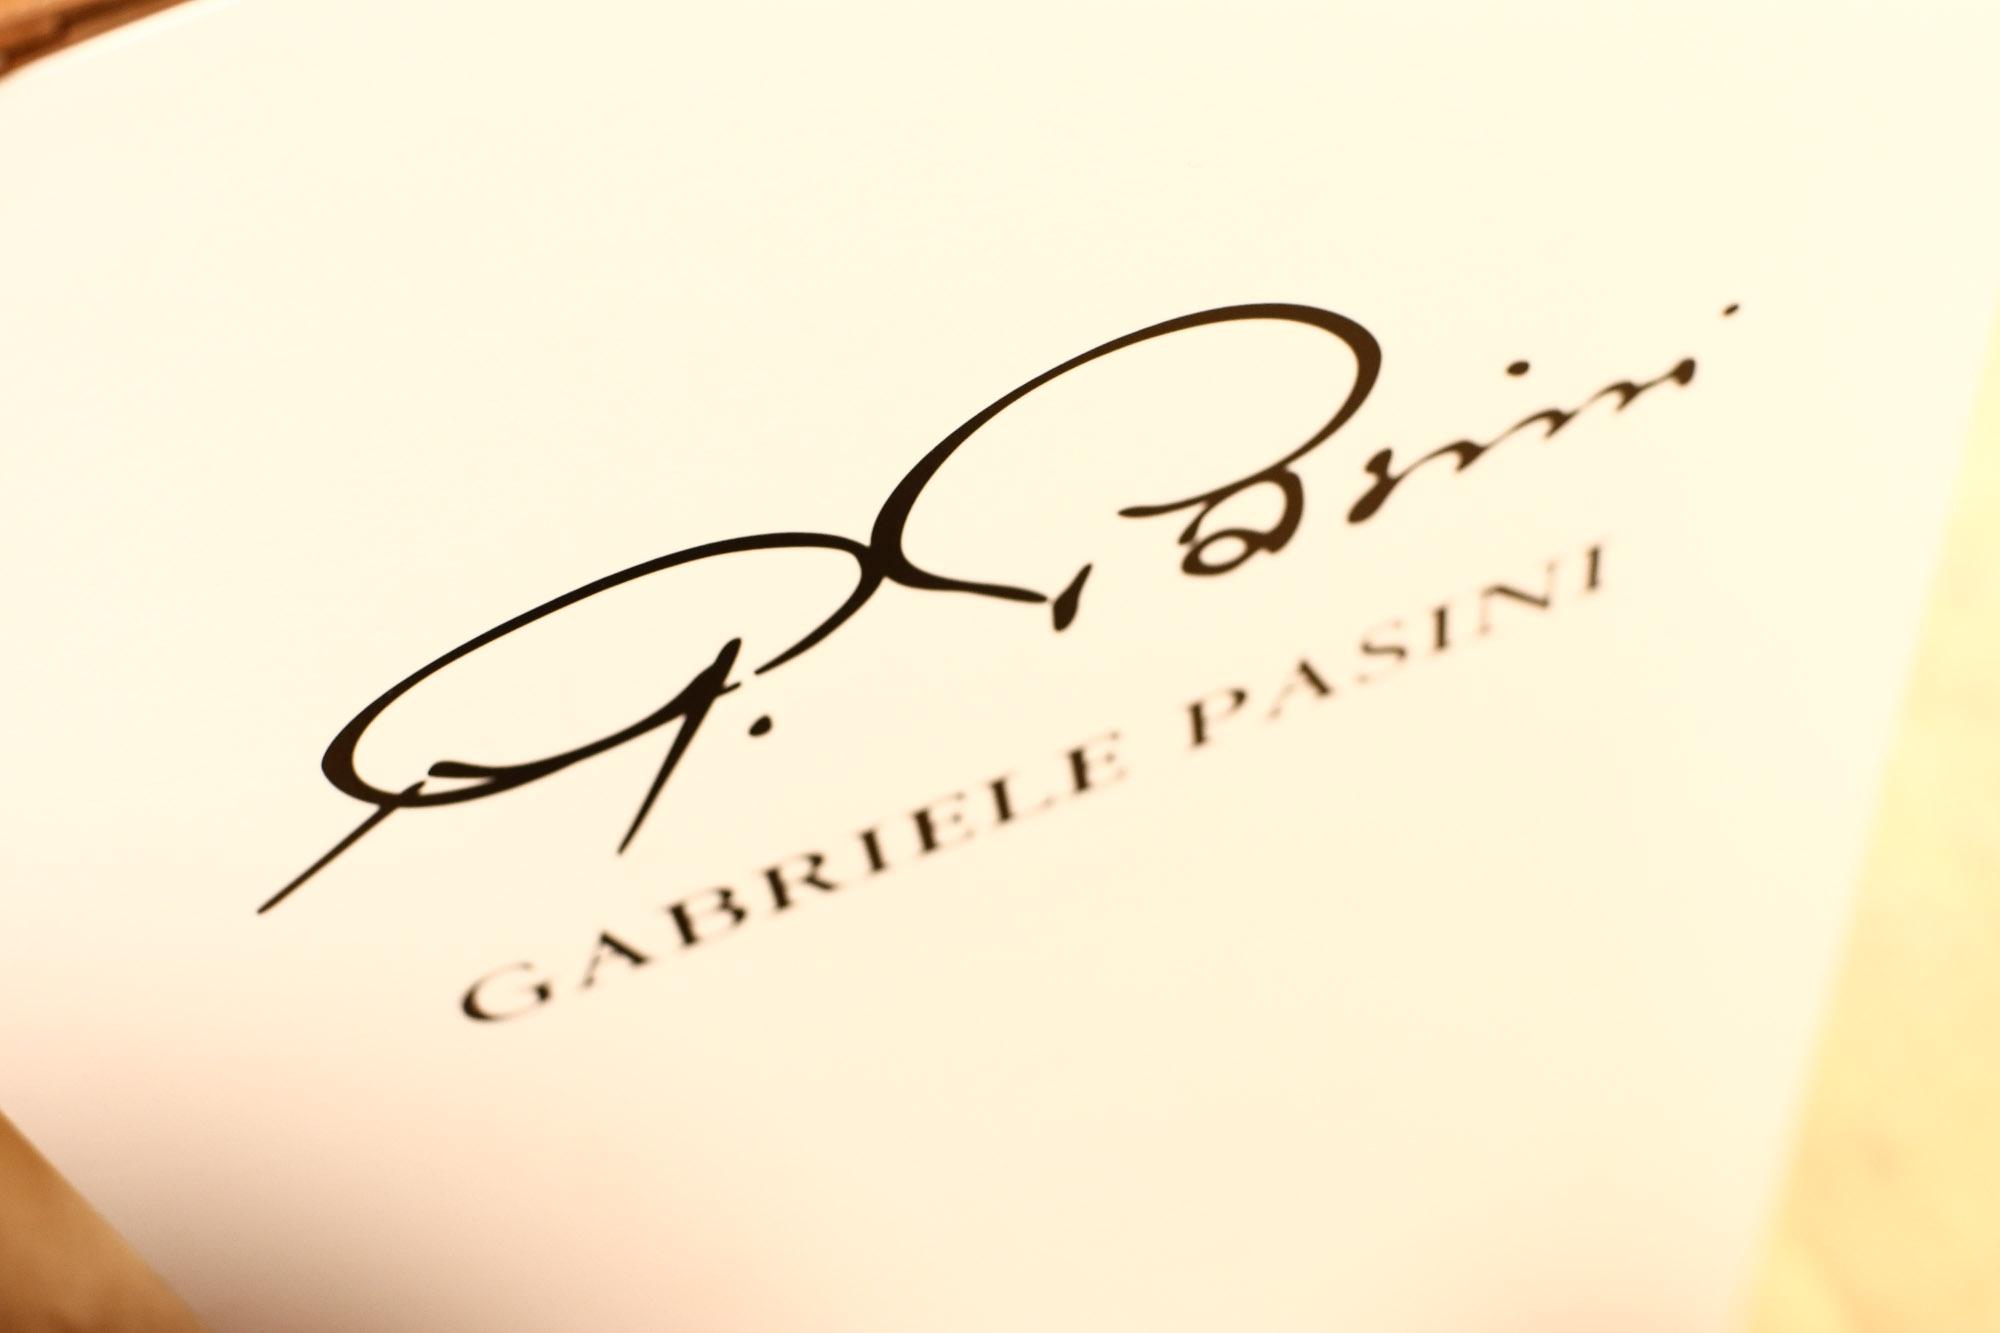 GABRIELE PASINI / ガブリエレ パジーニ (2017 秋冬 メイン 展示会) 愛知 名古屋 Alto e Diritto アルト エ デリット スーツ ジャケット セレクトショップ イタリア ストラスブルゴ  STRASBURGO gabrielepasini ガブリエレパジーニ